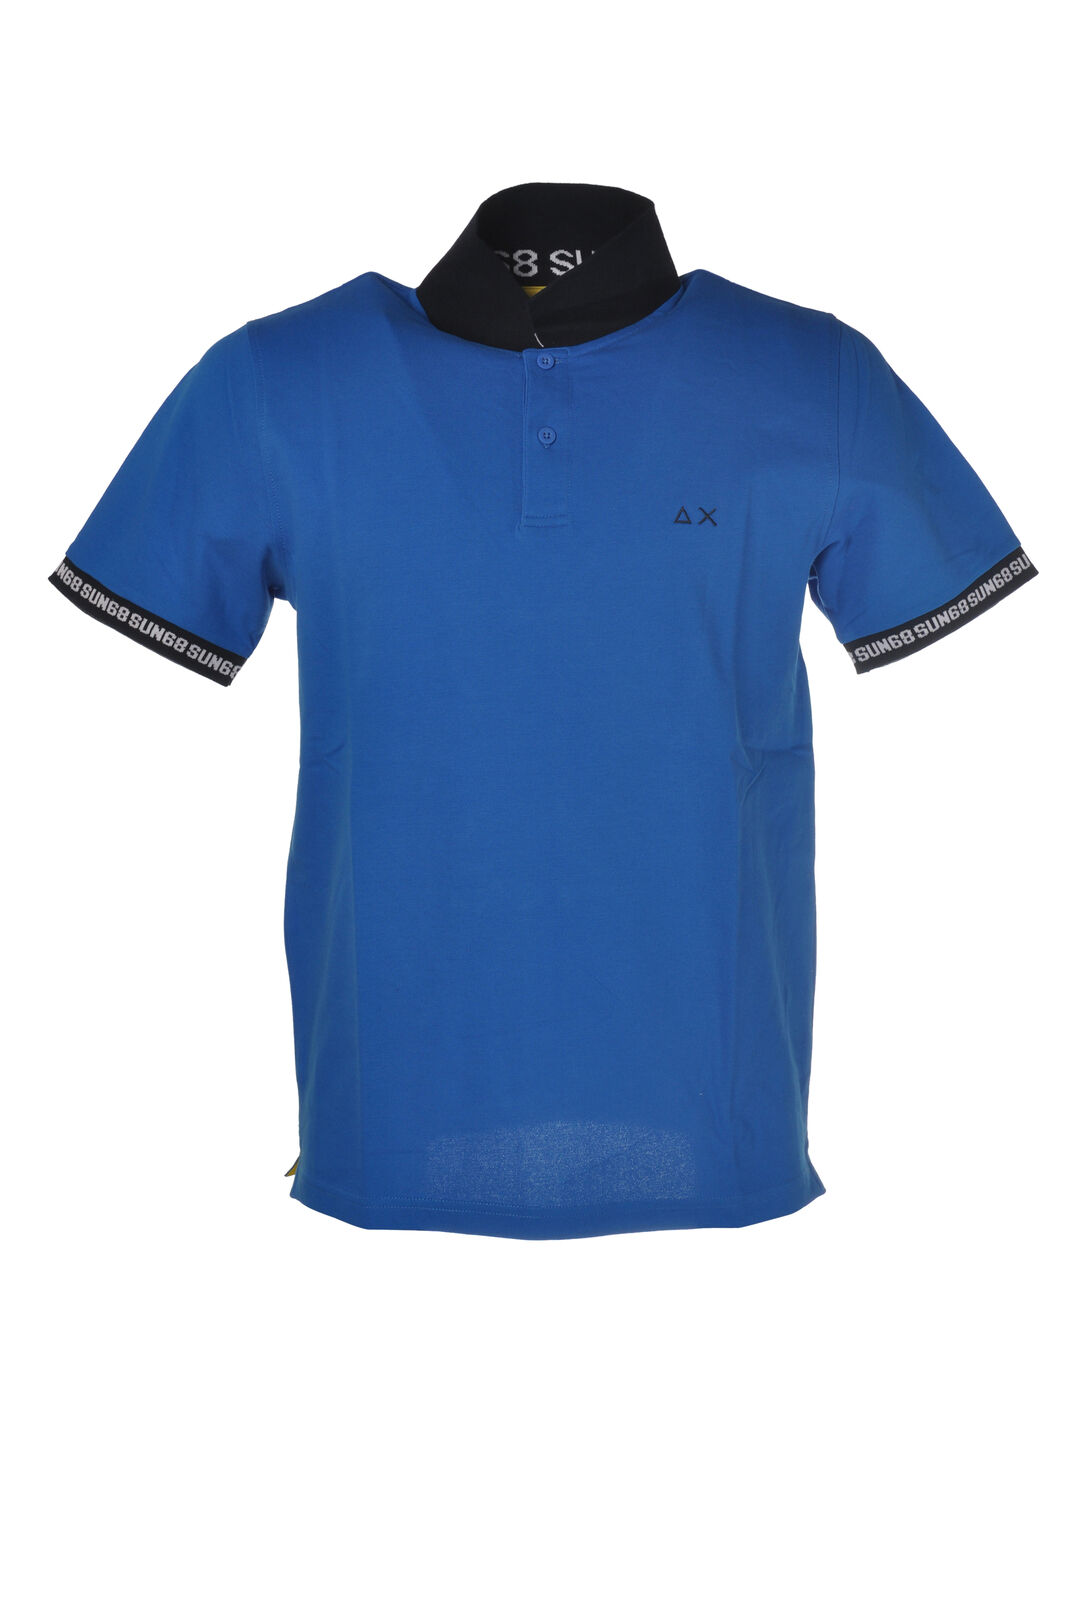 Sun 68 - Topwear Polo - Mann - blue - 5996113C190609